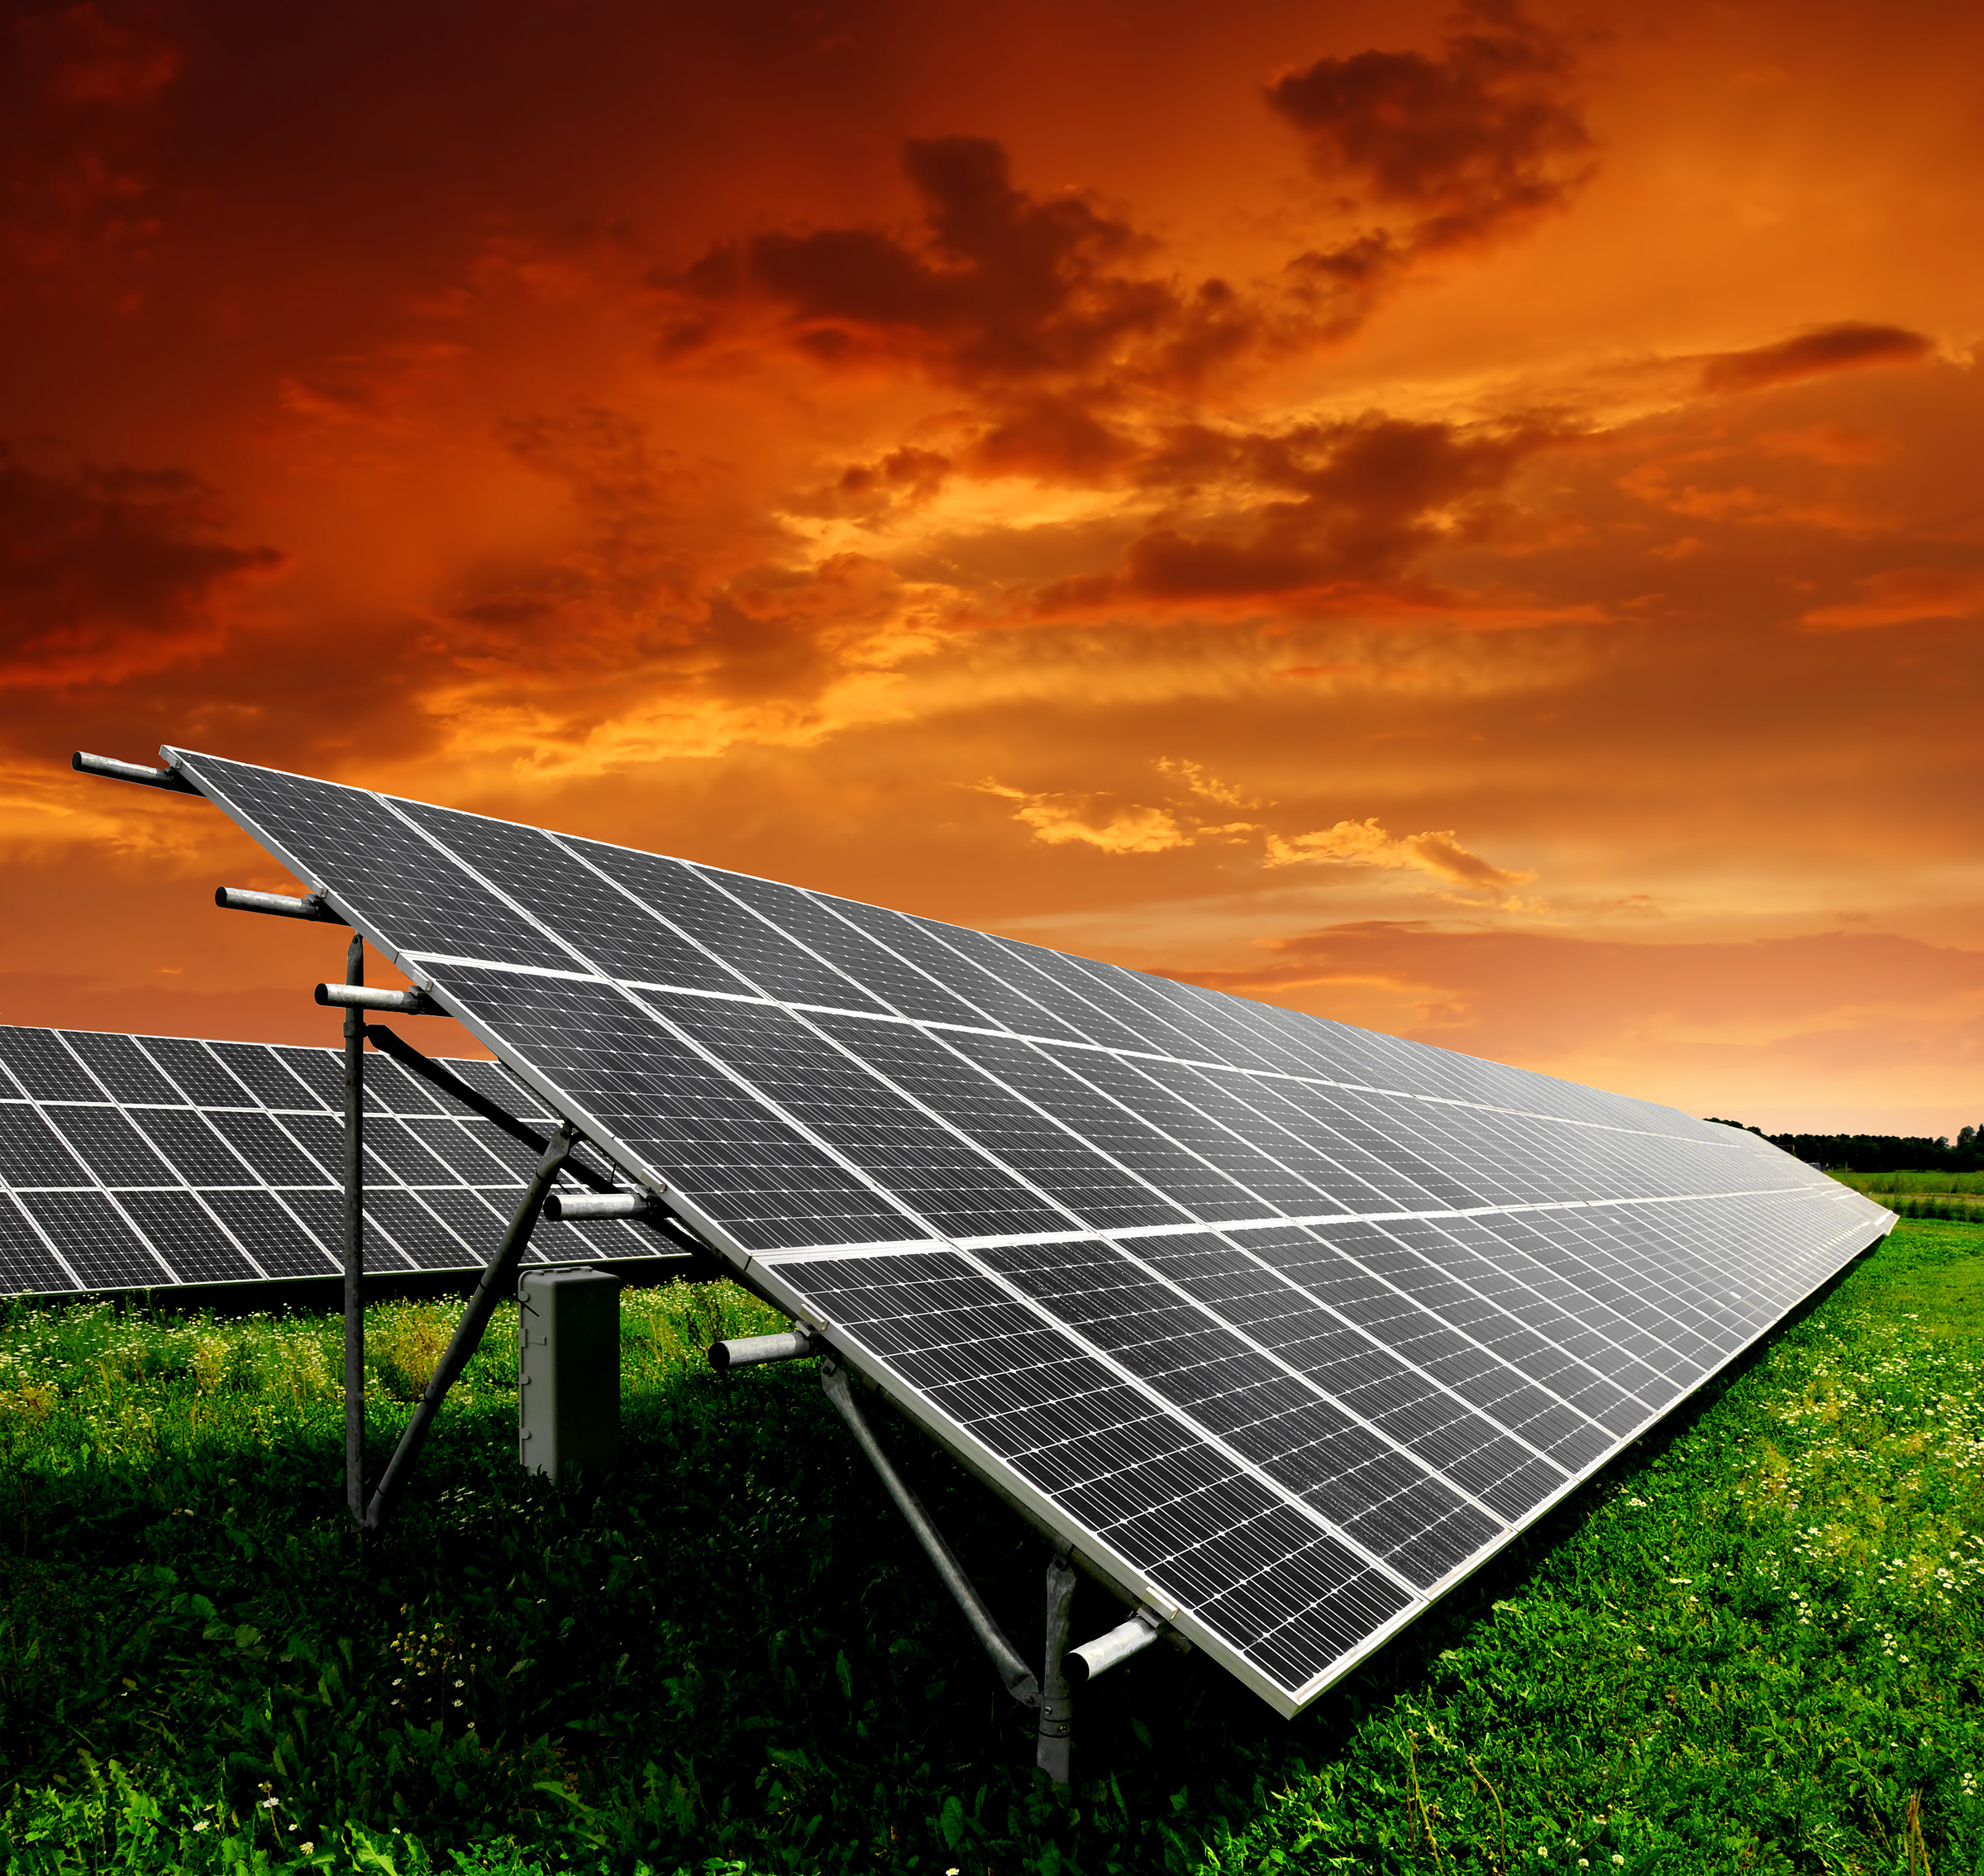 Planning Your Solar System: a Ballpark Estimator